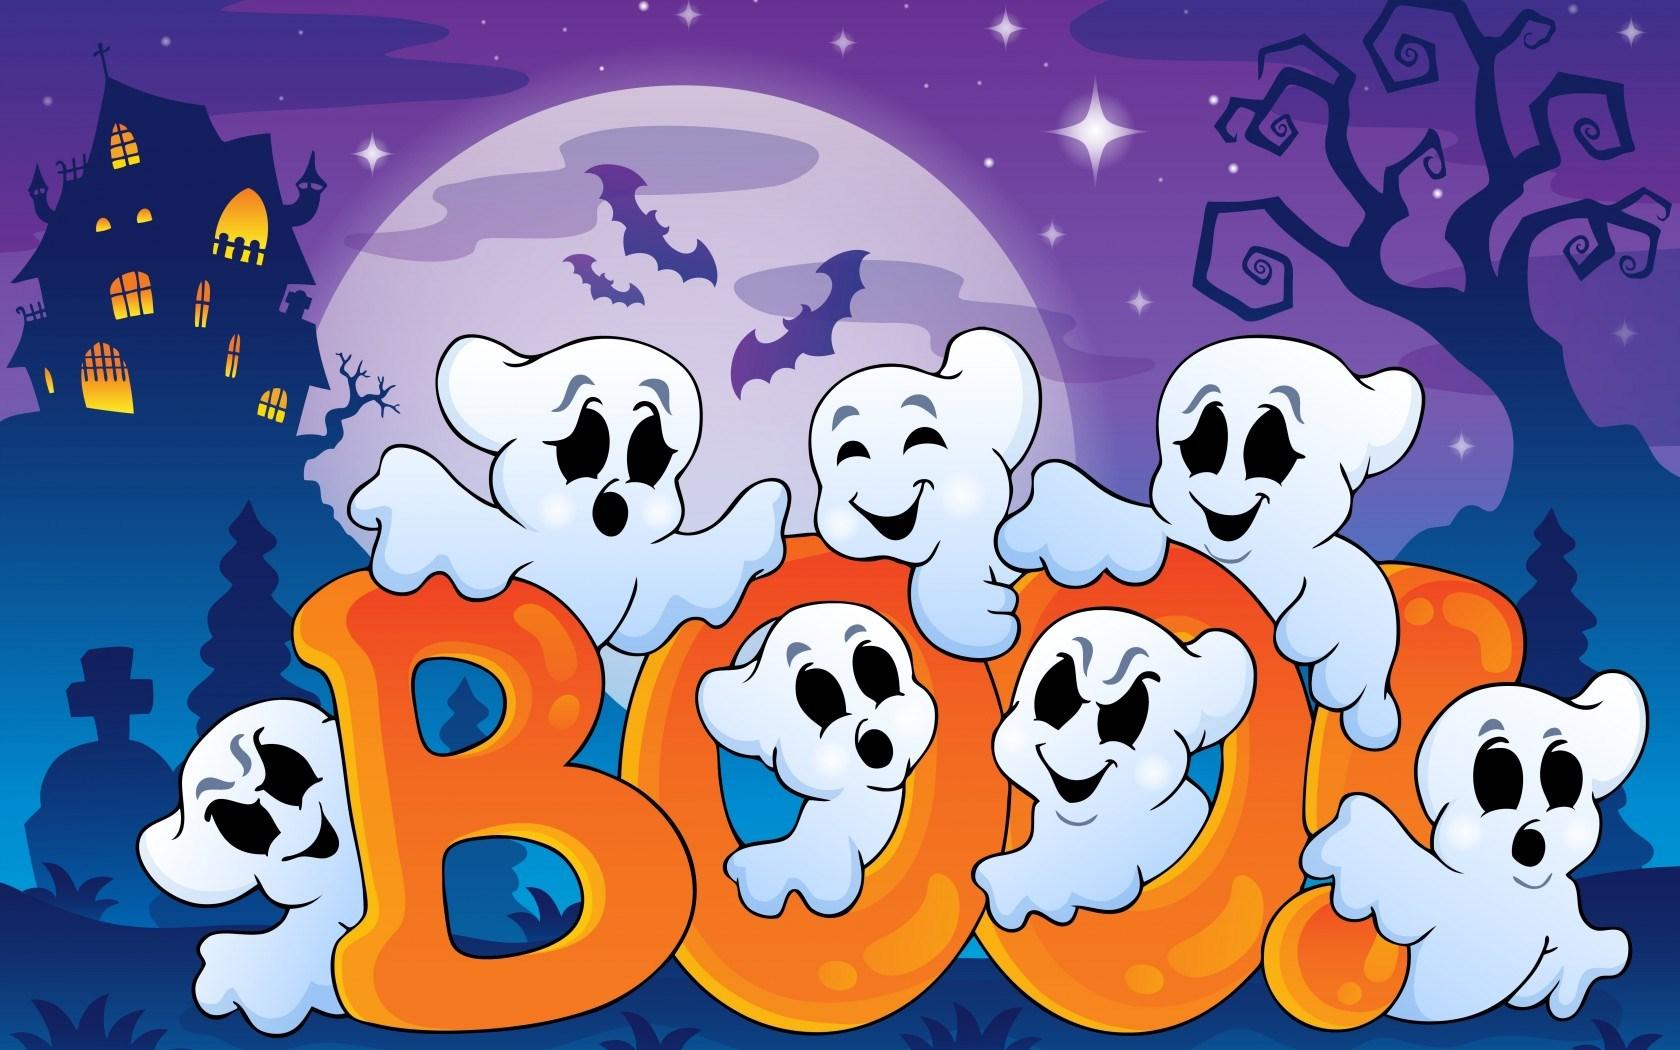 Halloween Funny Ghosts Creepy House Bats Boo Full Moon Art Vector